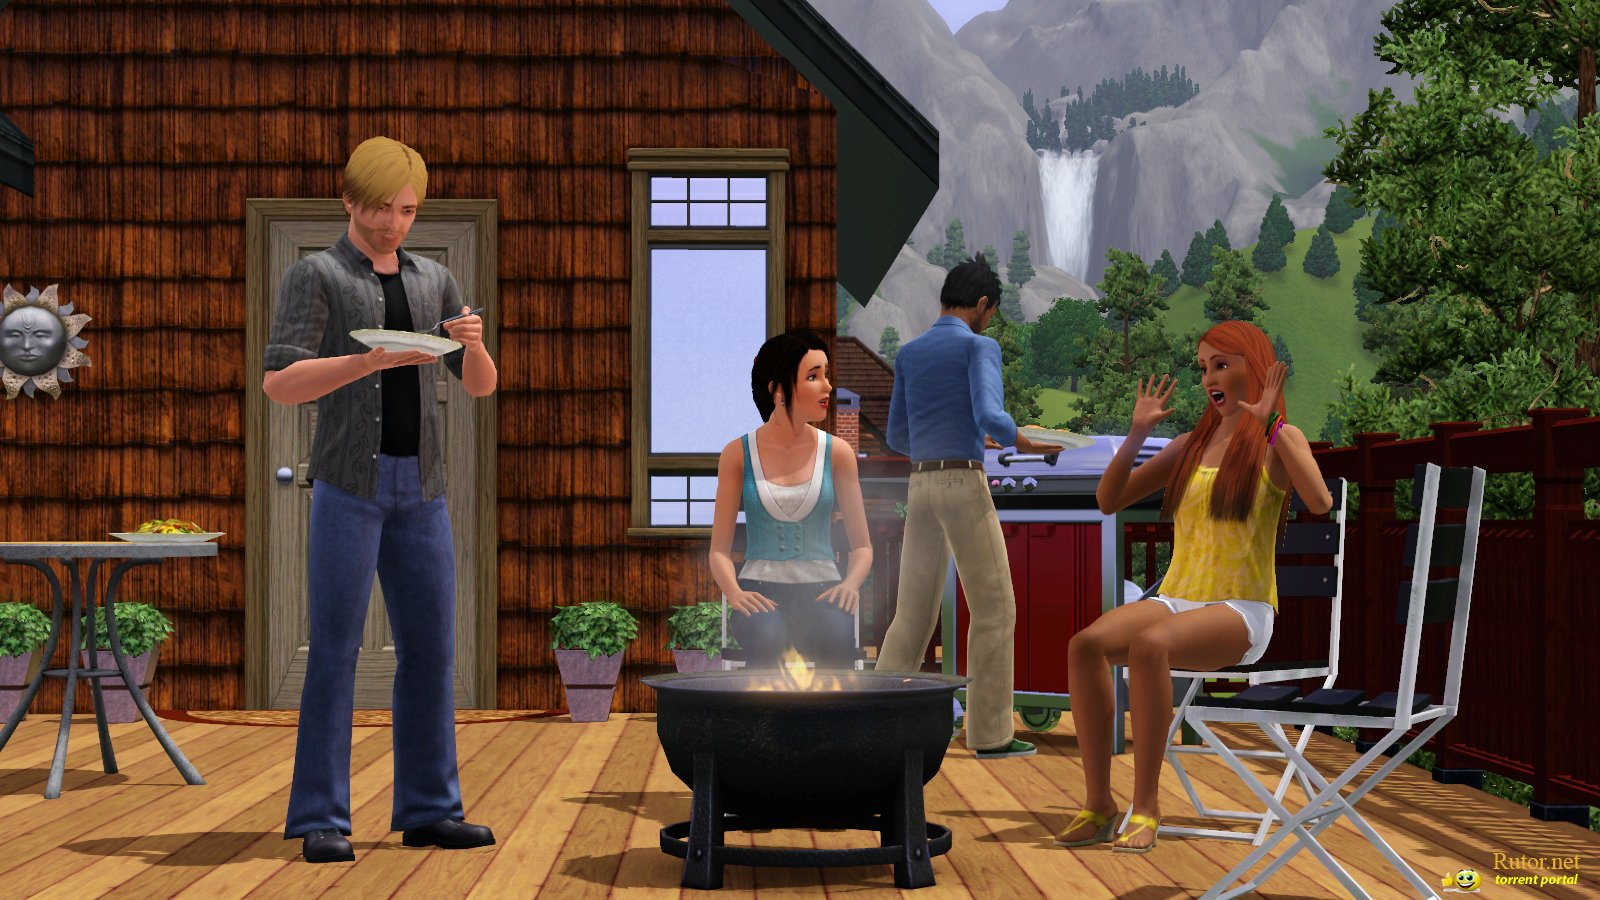 Sims 3 Original Торрент